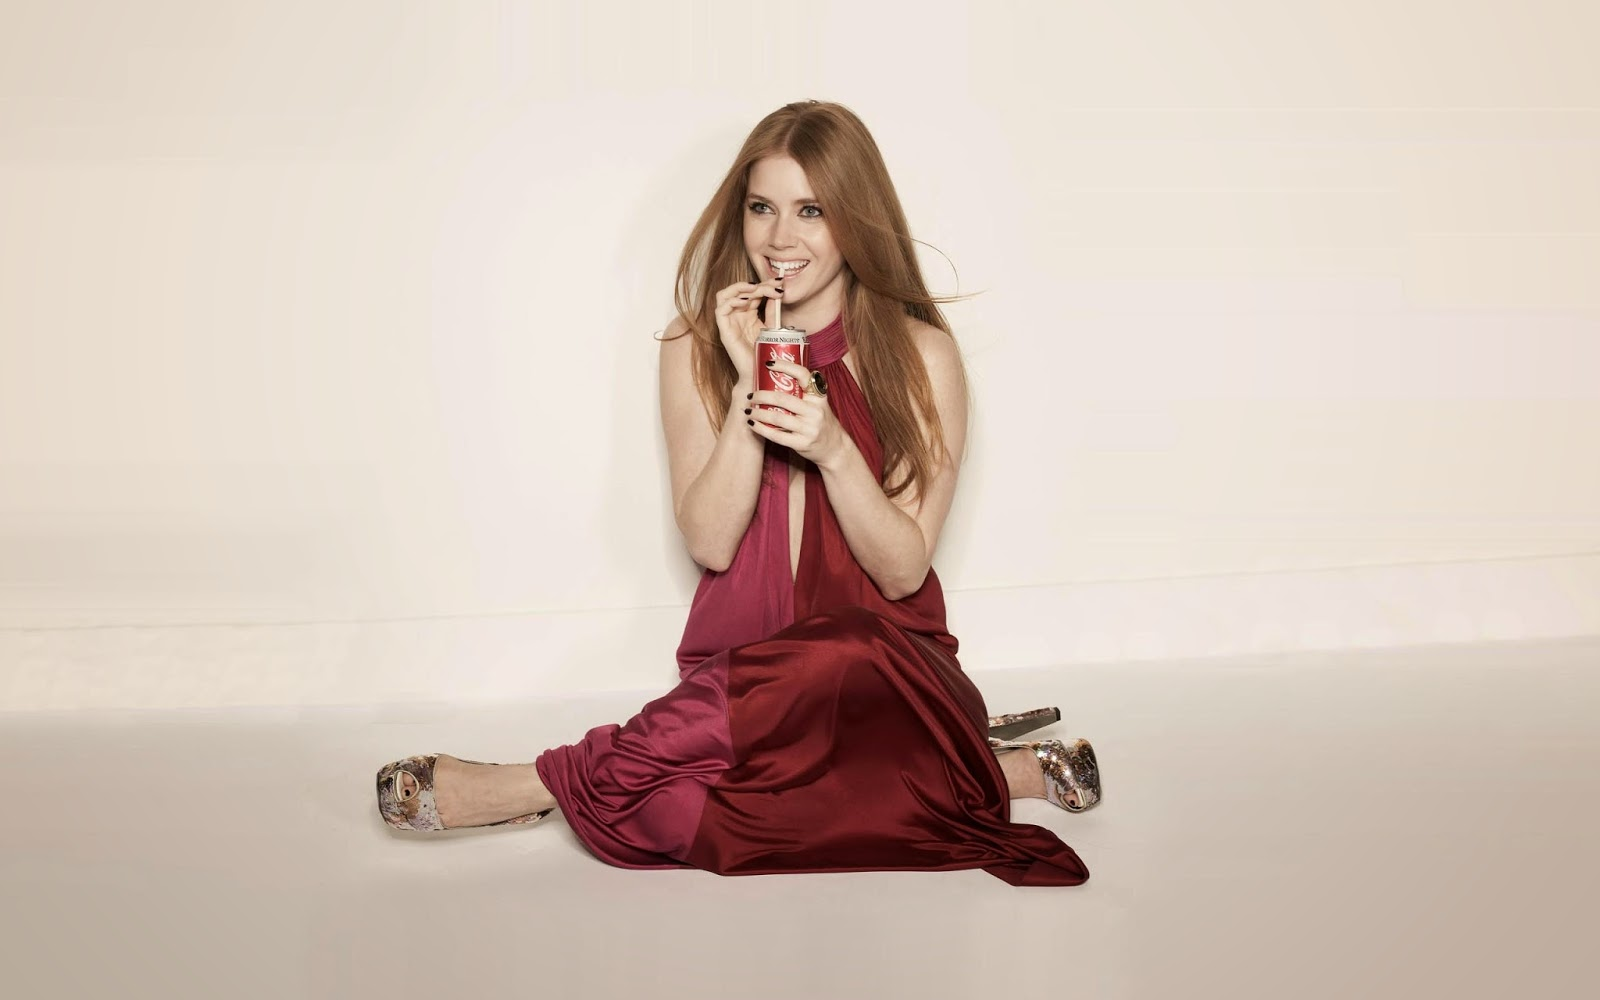 Amy adams drink a cocacola super images